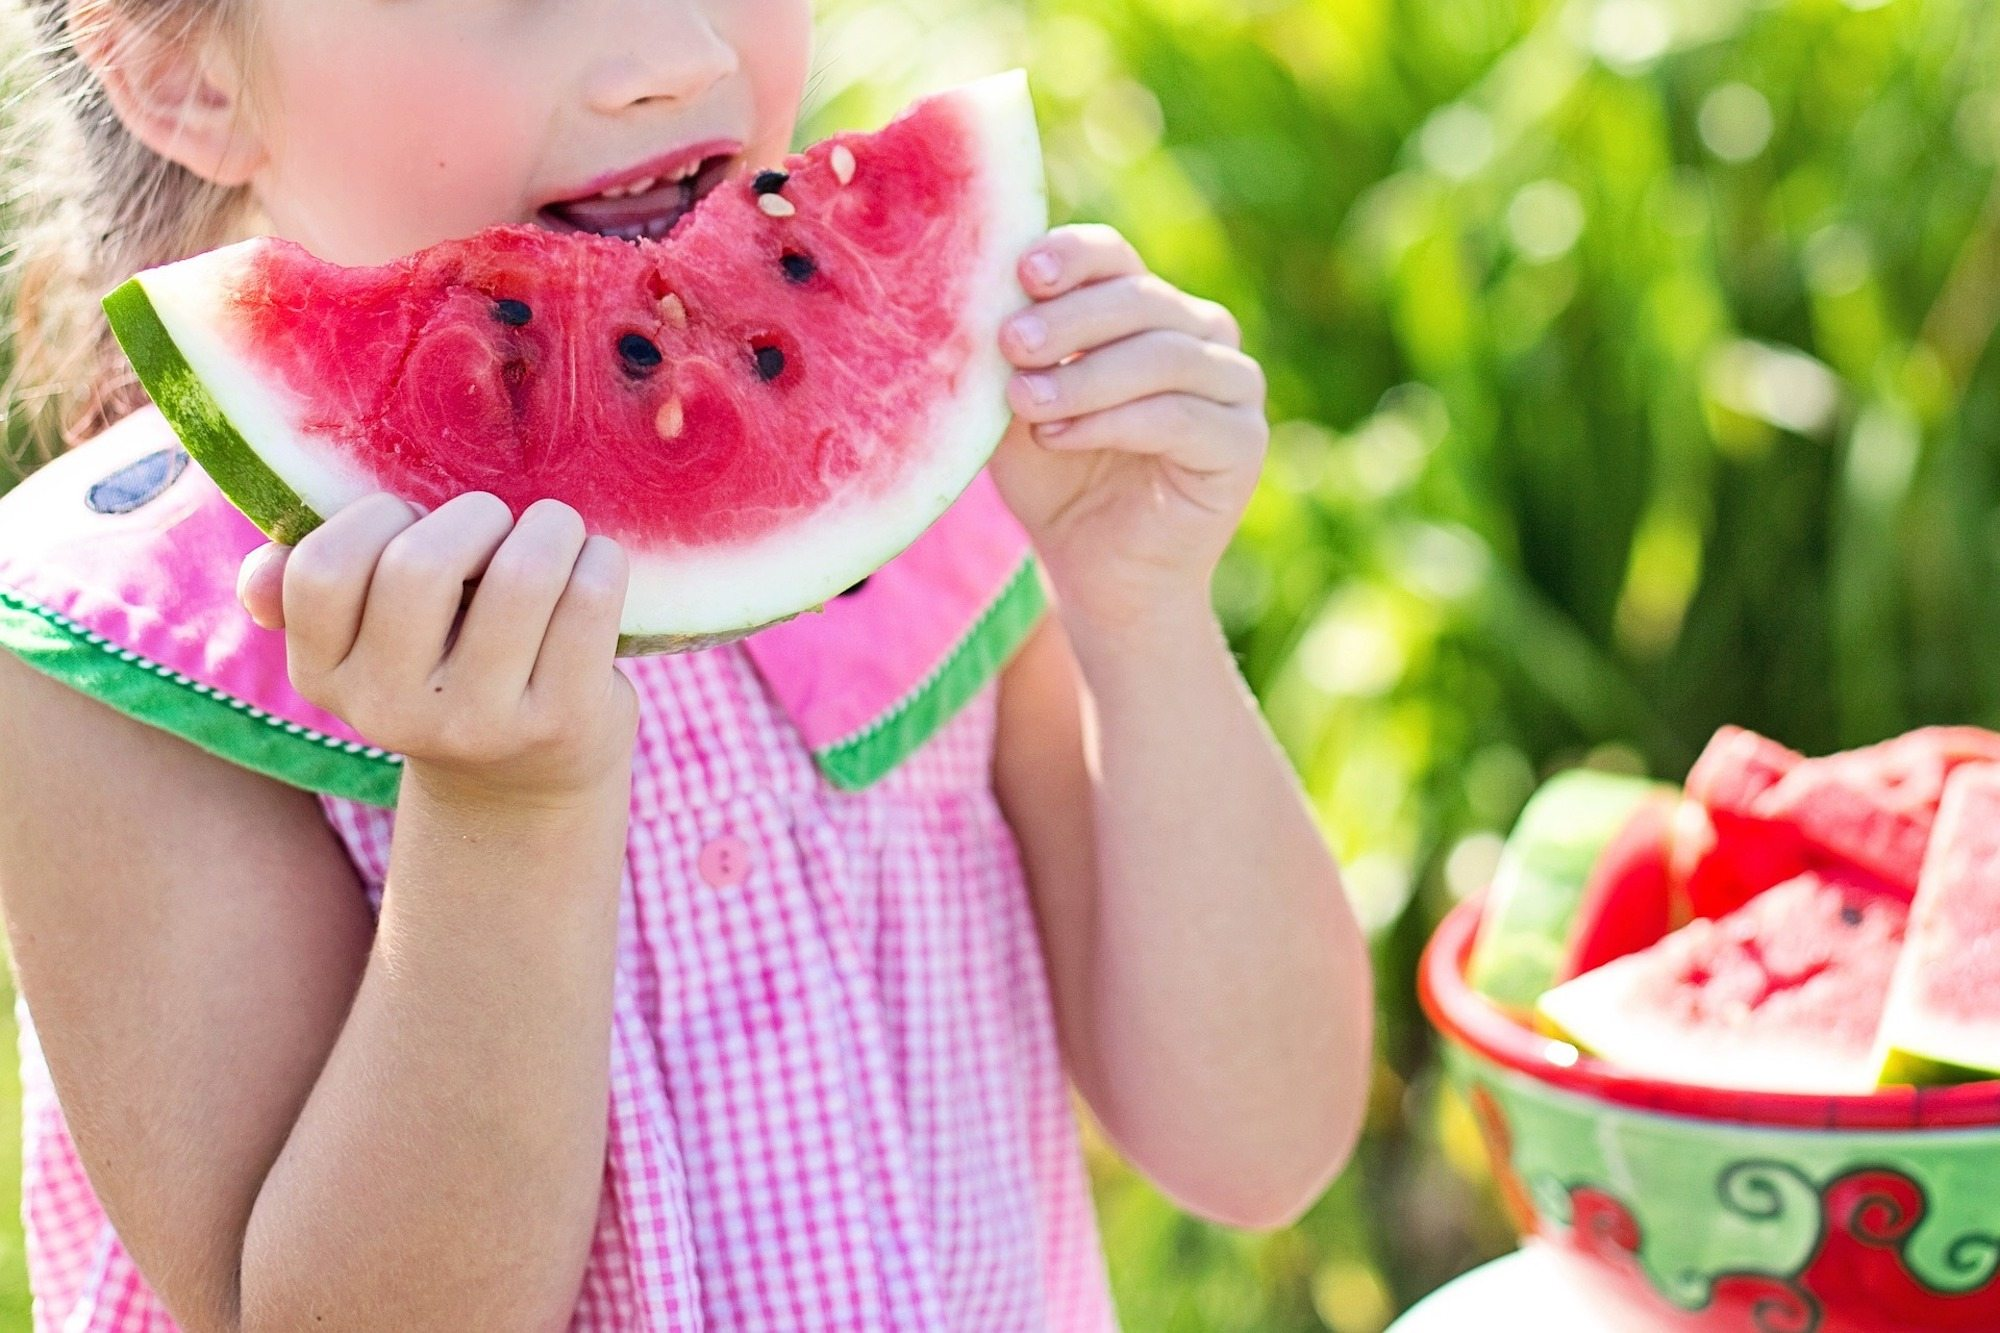 7 bali restaurants where kids eat for free ministry of villas